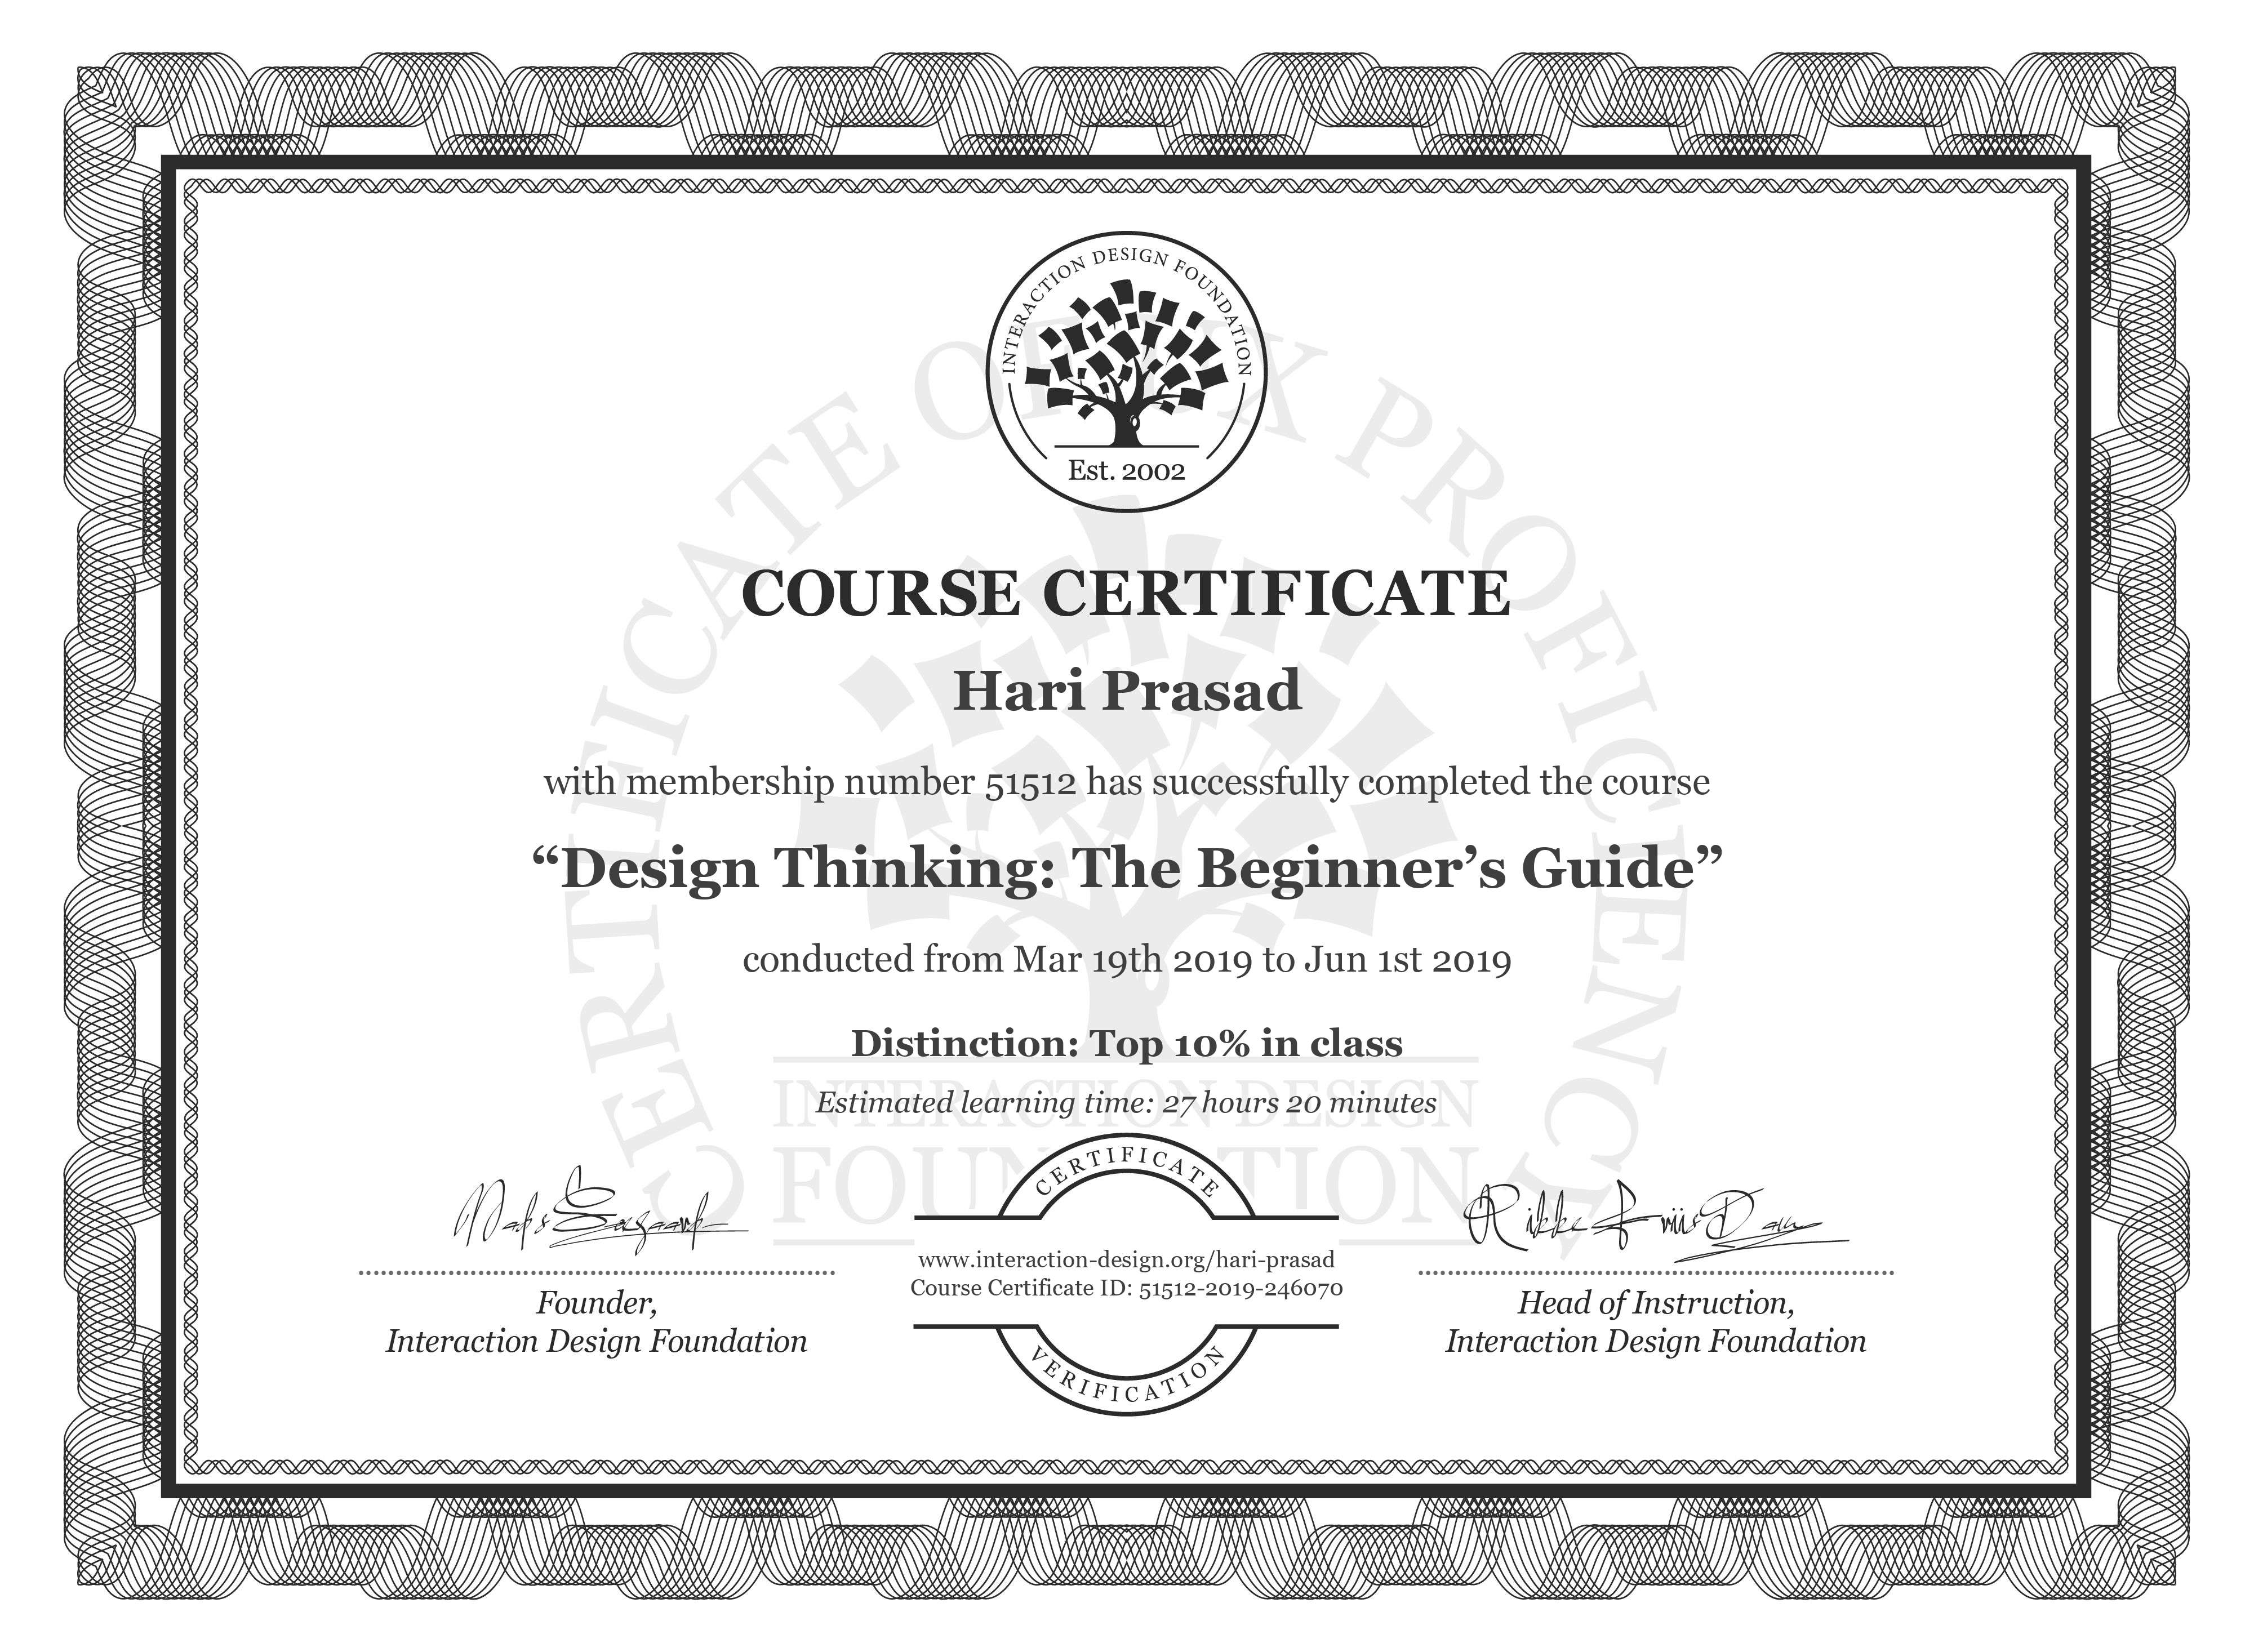 Hari Prasad's Course Certificate: Design Thinking: The Beginner's Guide